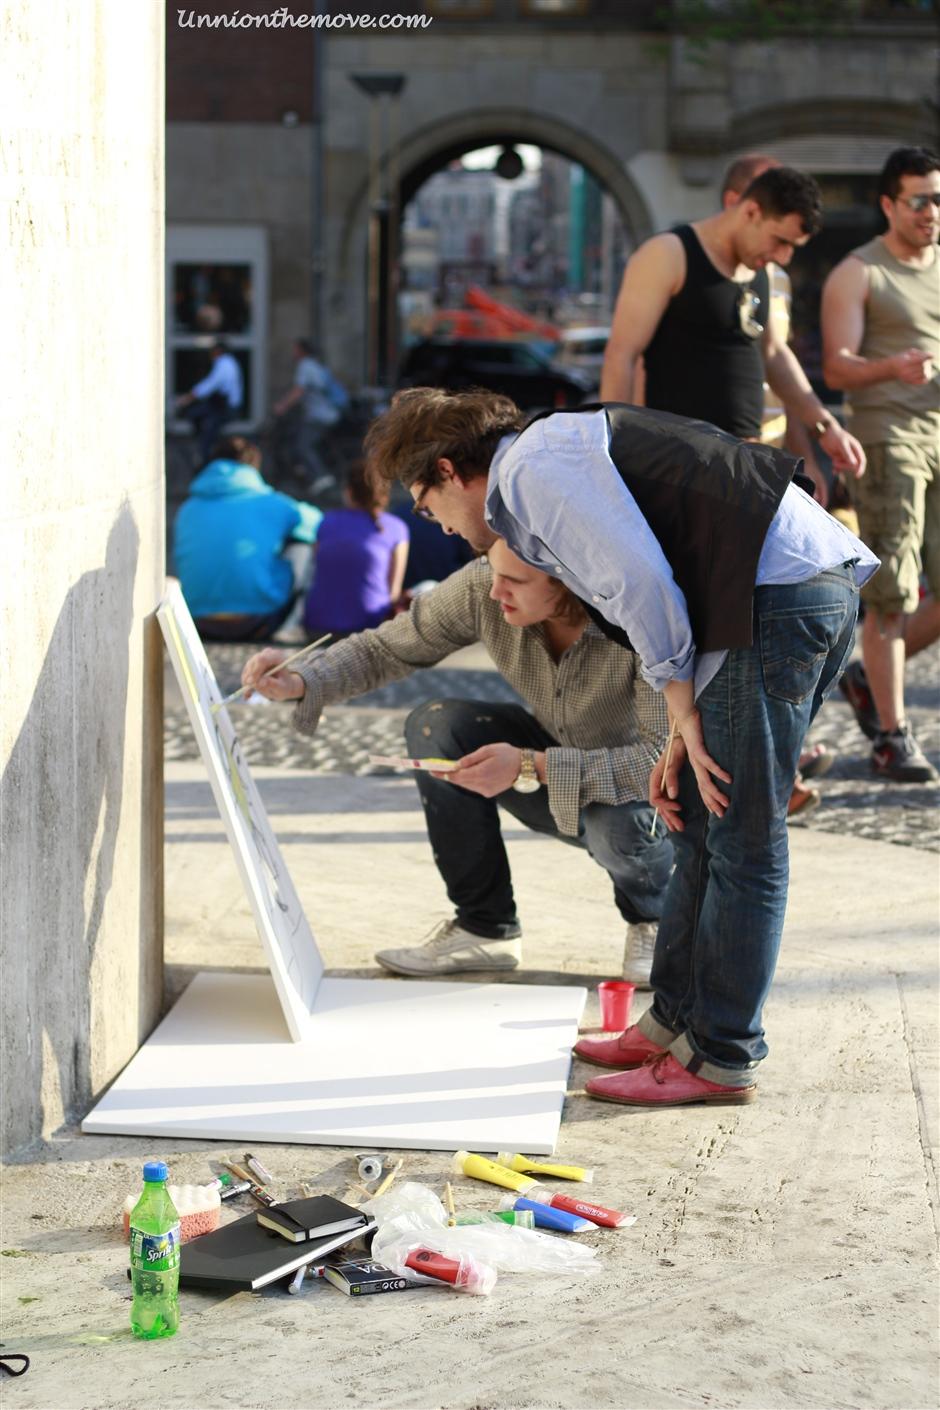 A Street artist in Amsterdam